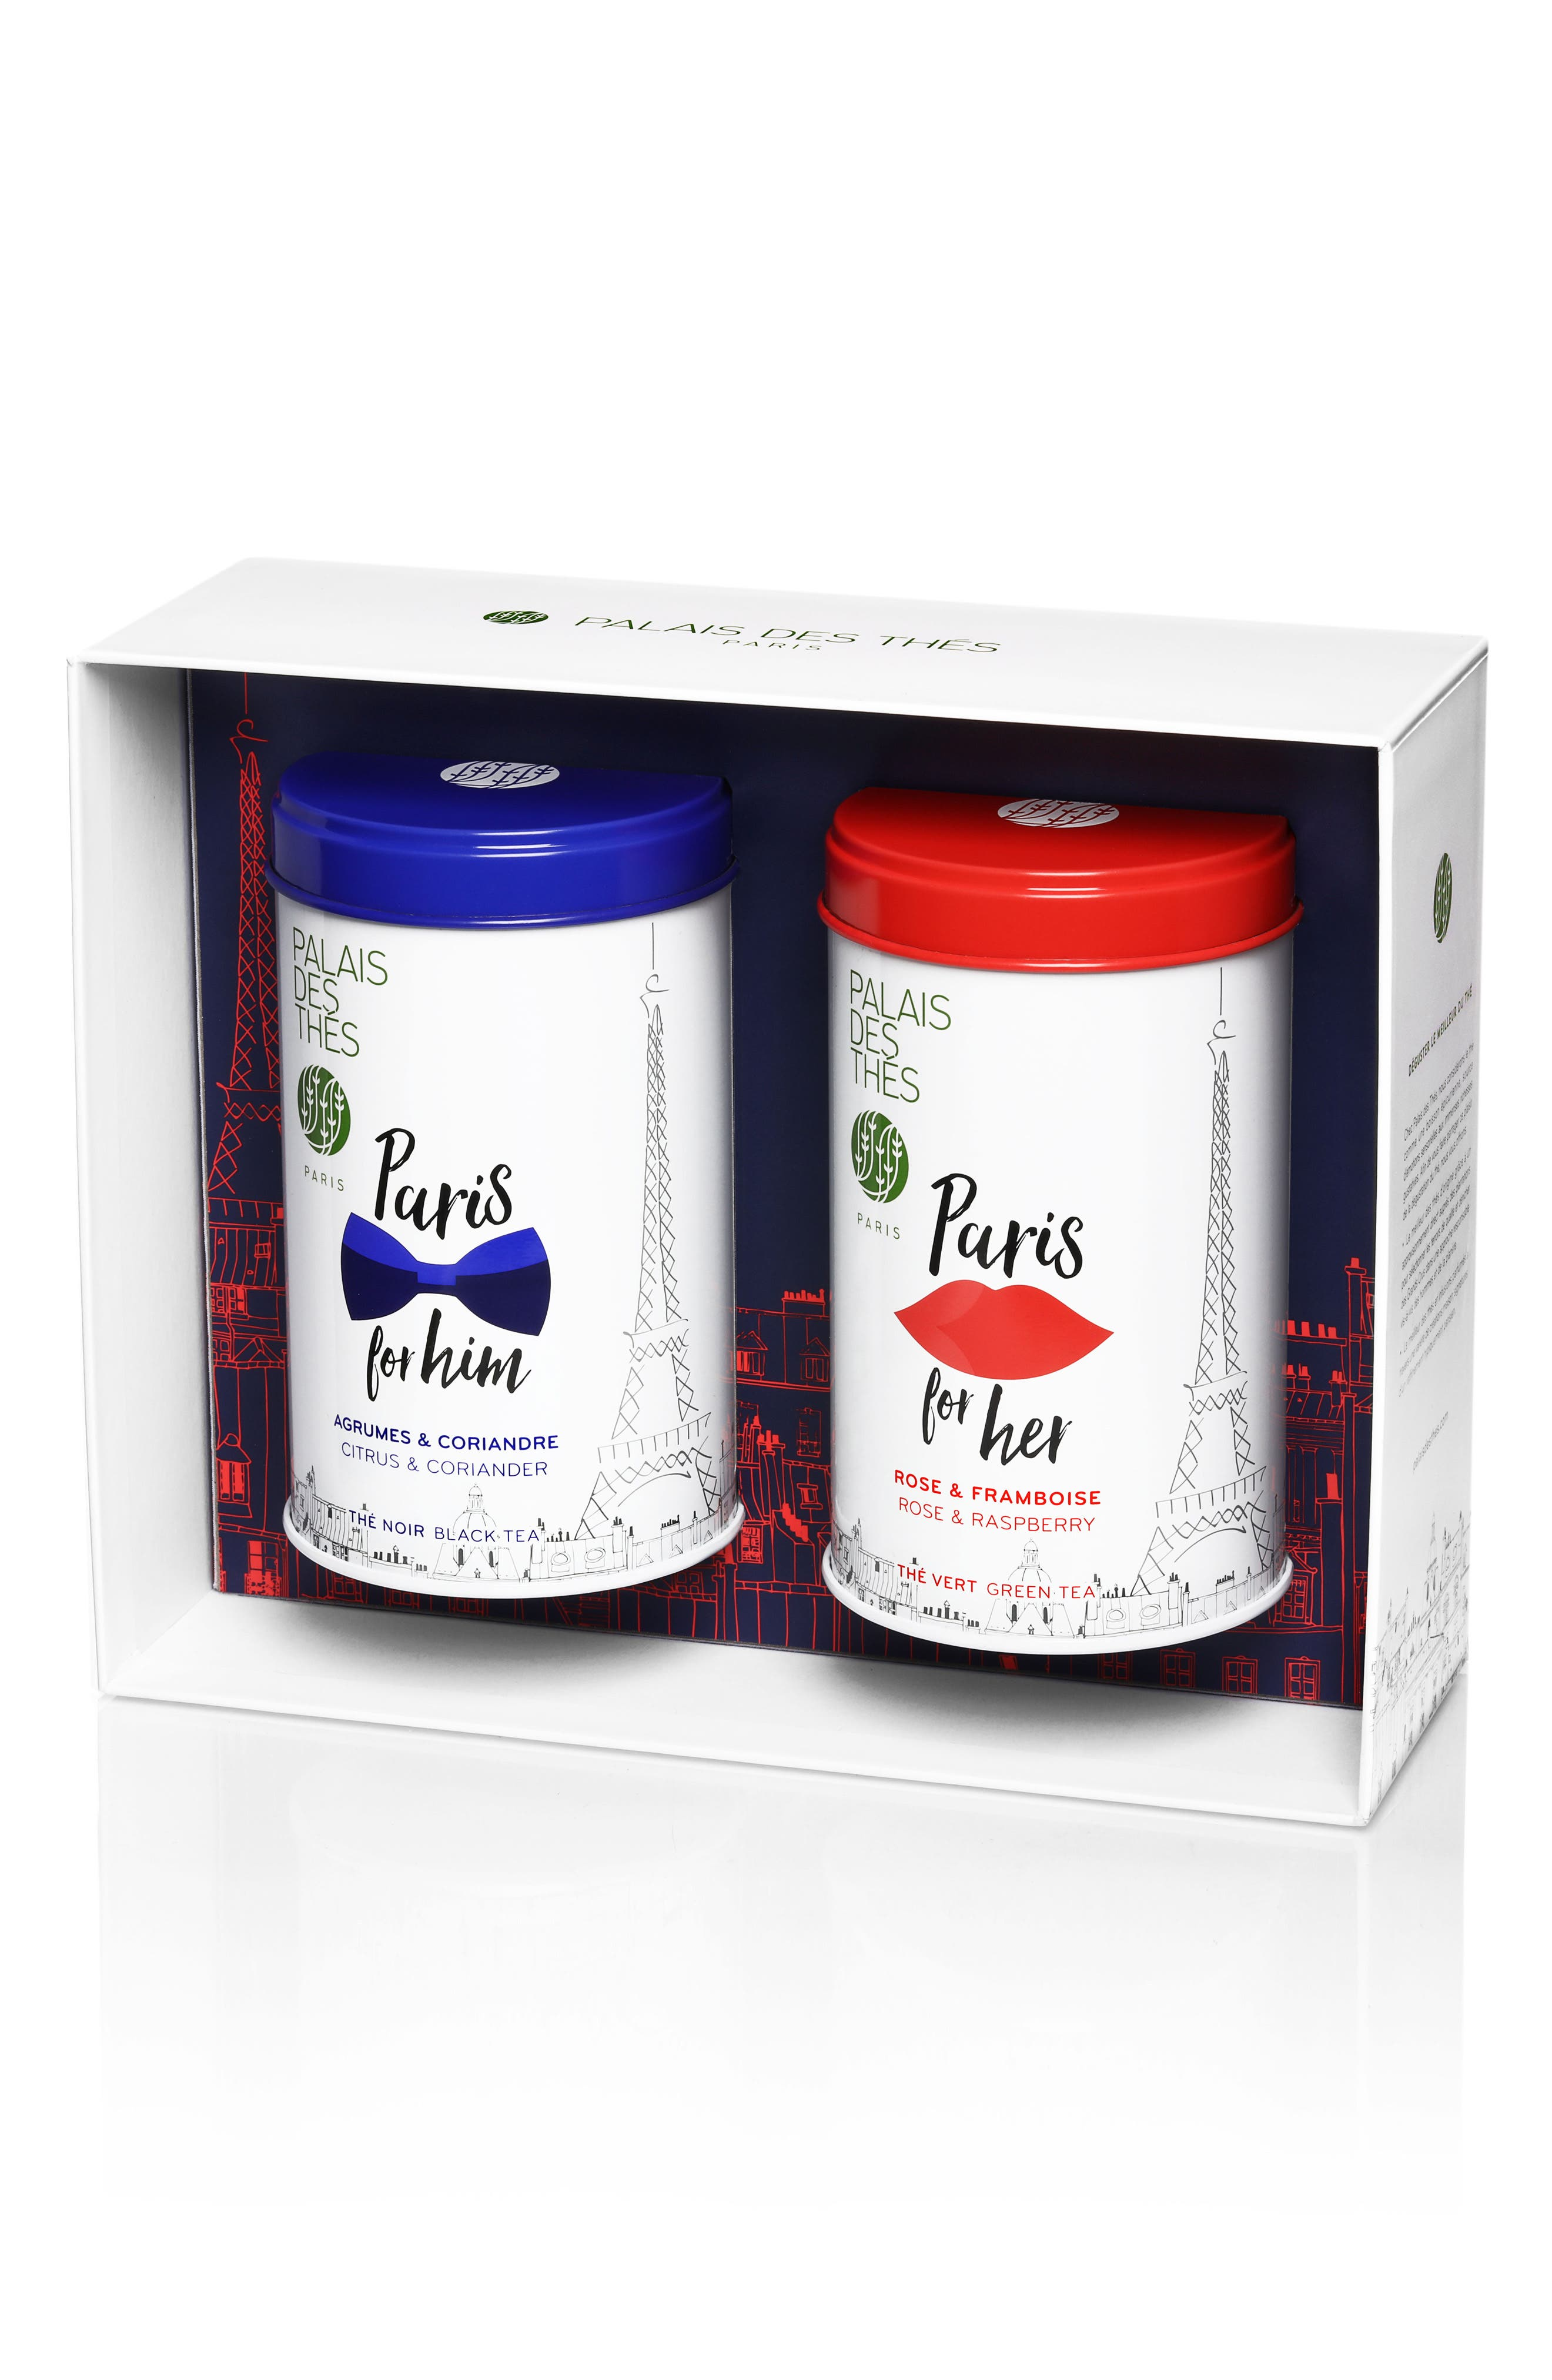 Main Image - Palais des Thés Paris for Him & Her Loose Tea Duo